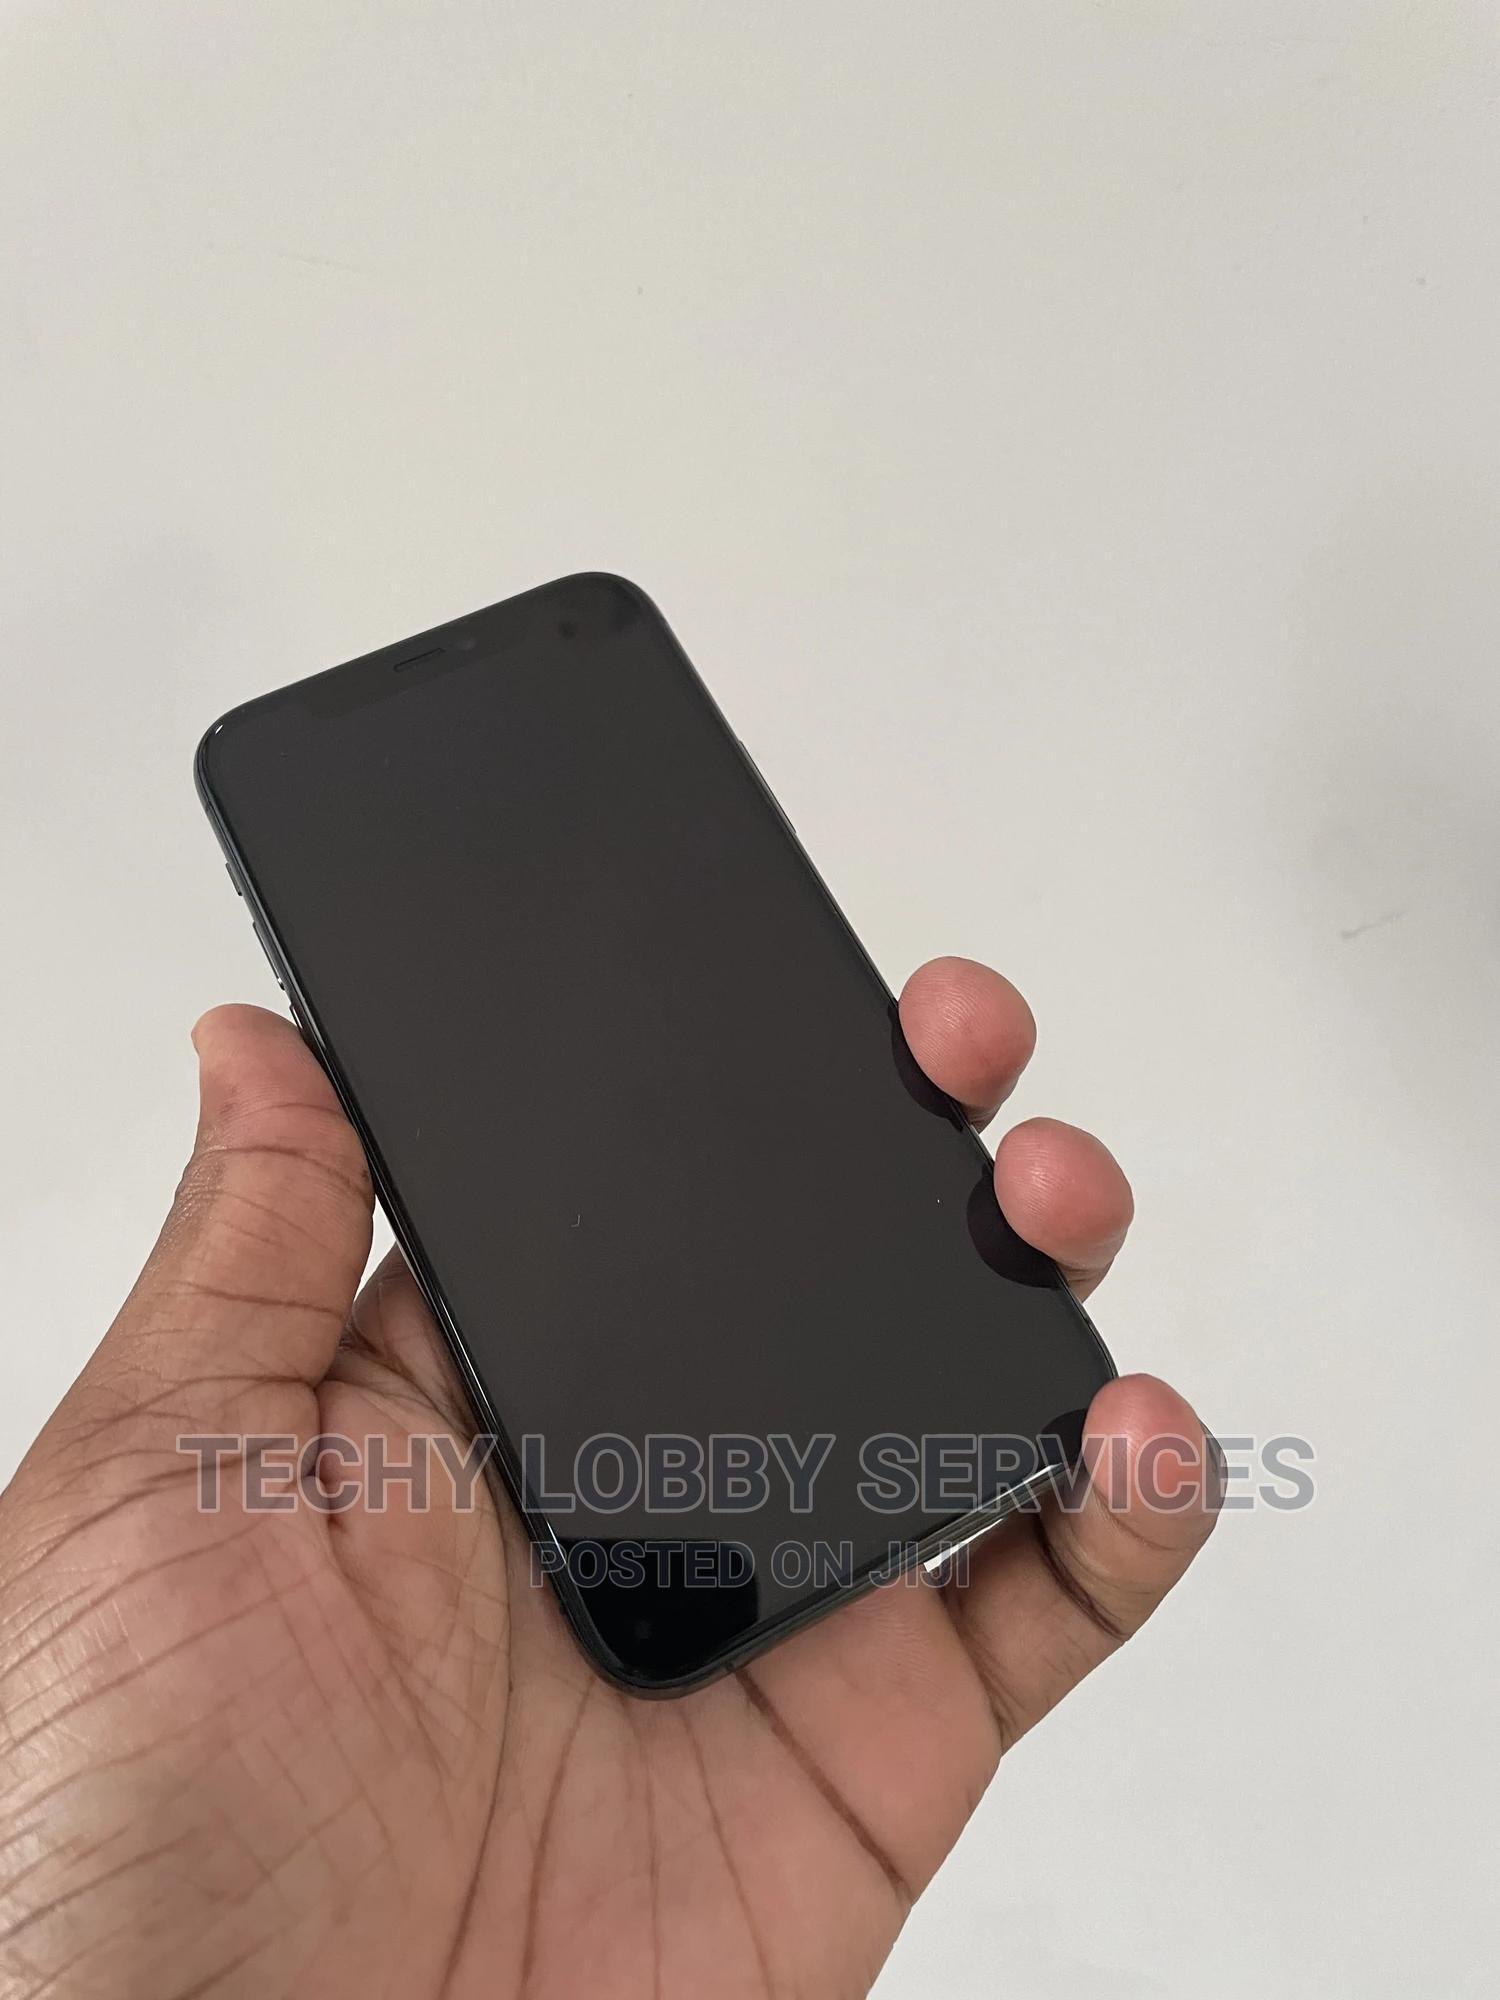 Apple iPhone 11 Pro 256 GB Black | Mobile Phones for sale in Gbagada, Lagos State, Nigeria